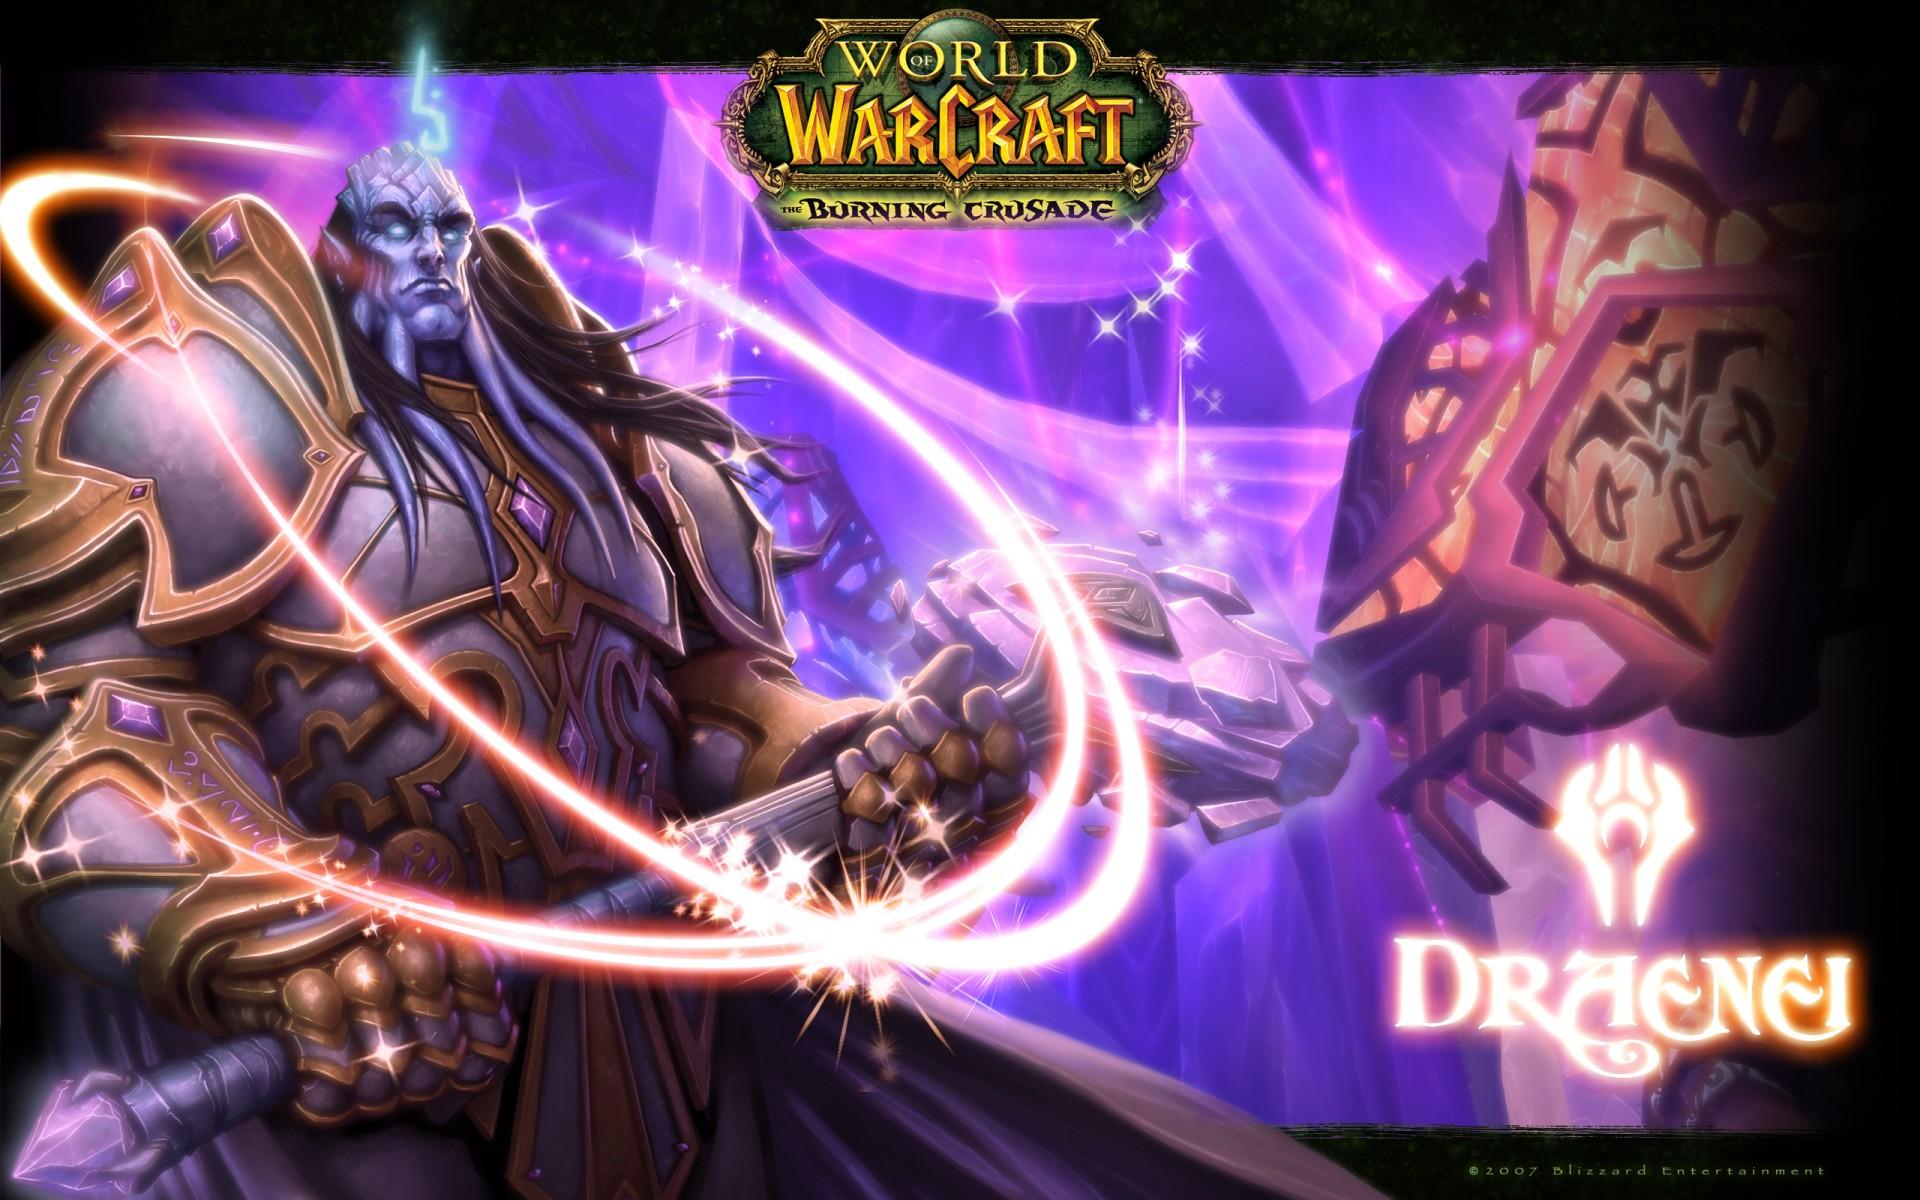 World of Warcraft draenie porn videos erotic pictures